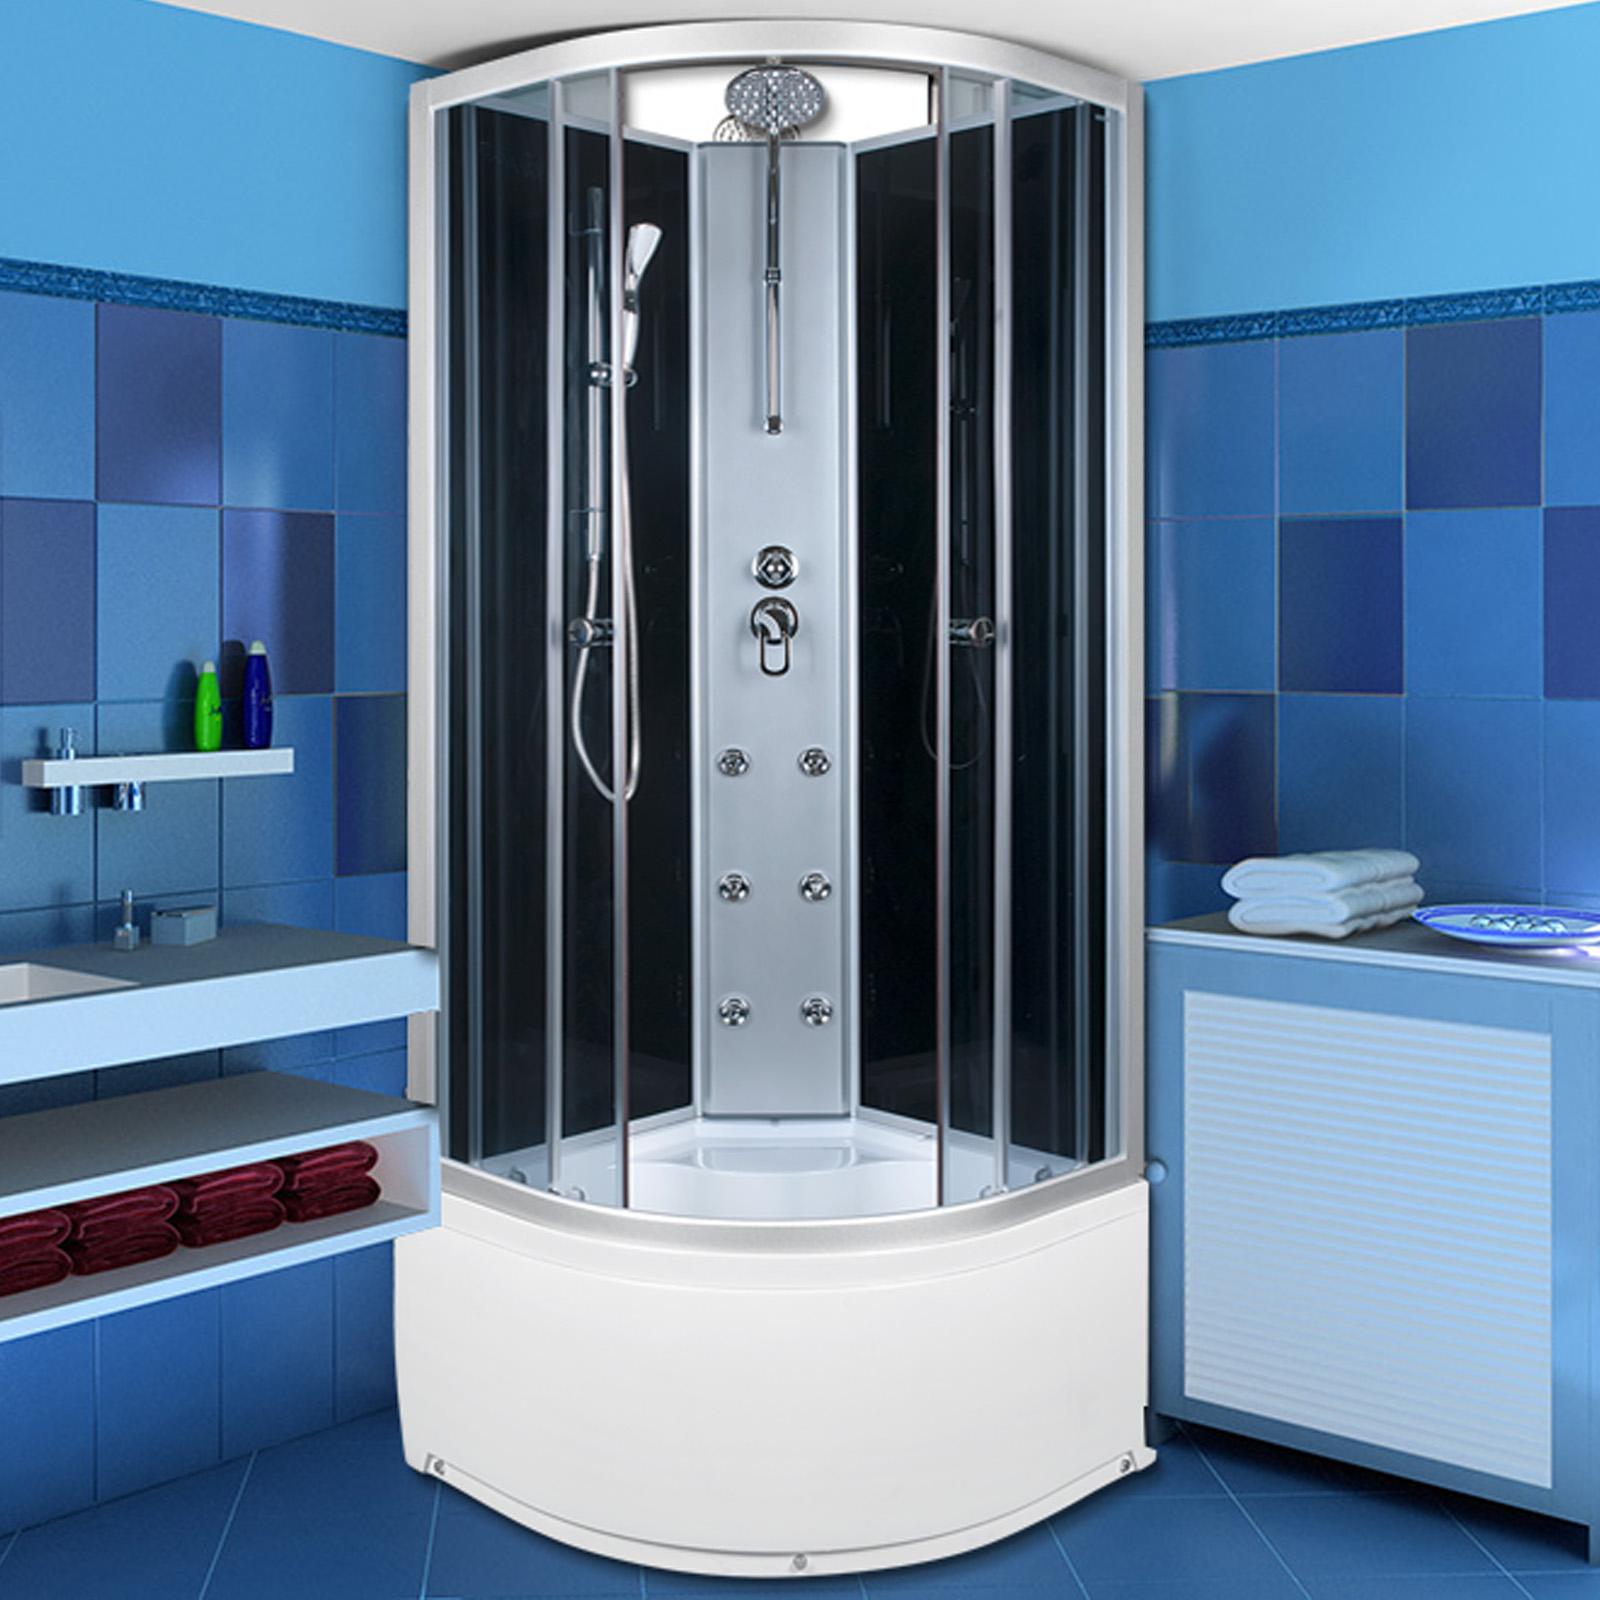 Full Size of Duschkabine Regendusche Fertigdusche Dusche Duschwand Duschtempel Haltegriff Moderne Duschen Sprinz Glastrennwand Grohe Thermostat Einbauen Breuer Ebenerdige Dusche Dusche 90x90